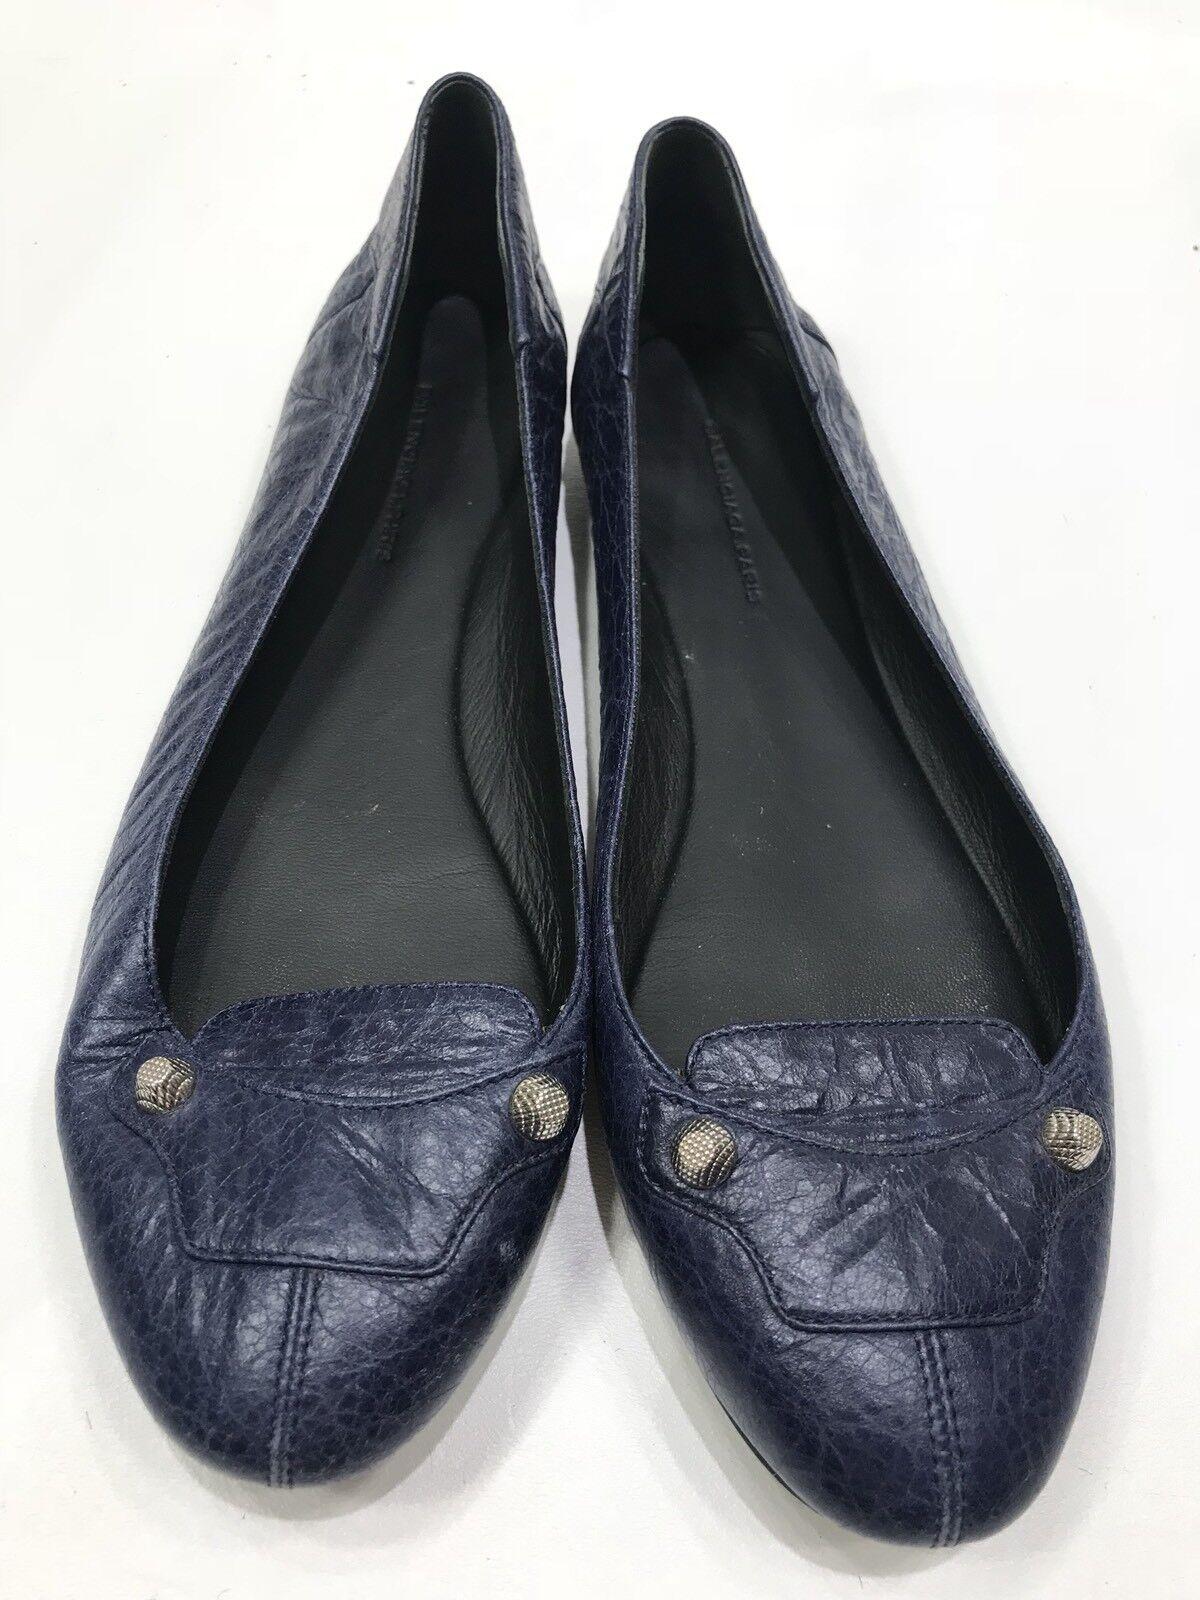 BALENCIAGA ARENA BALLET FLATS 40 Navy bluee Leather gold STUDDED STUDDED STUDDED Hardware 8.5 9 b6349f